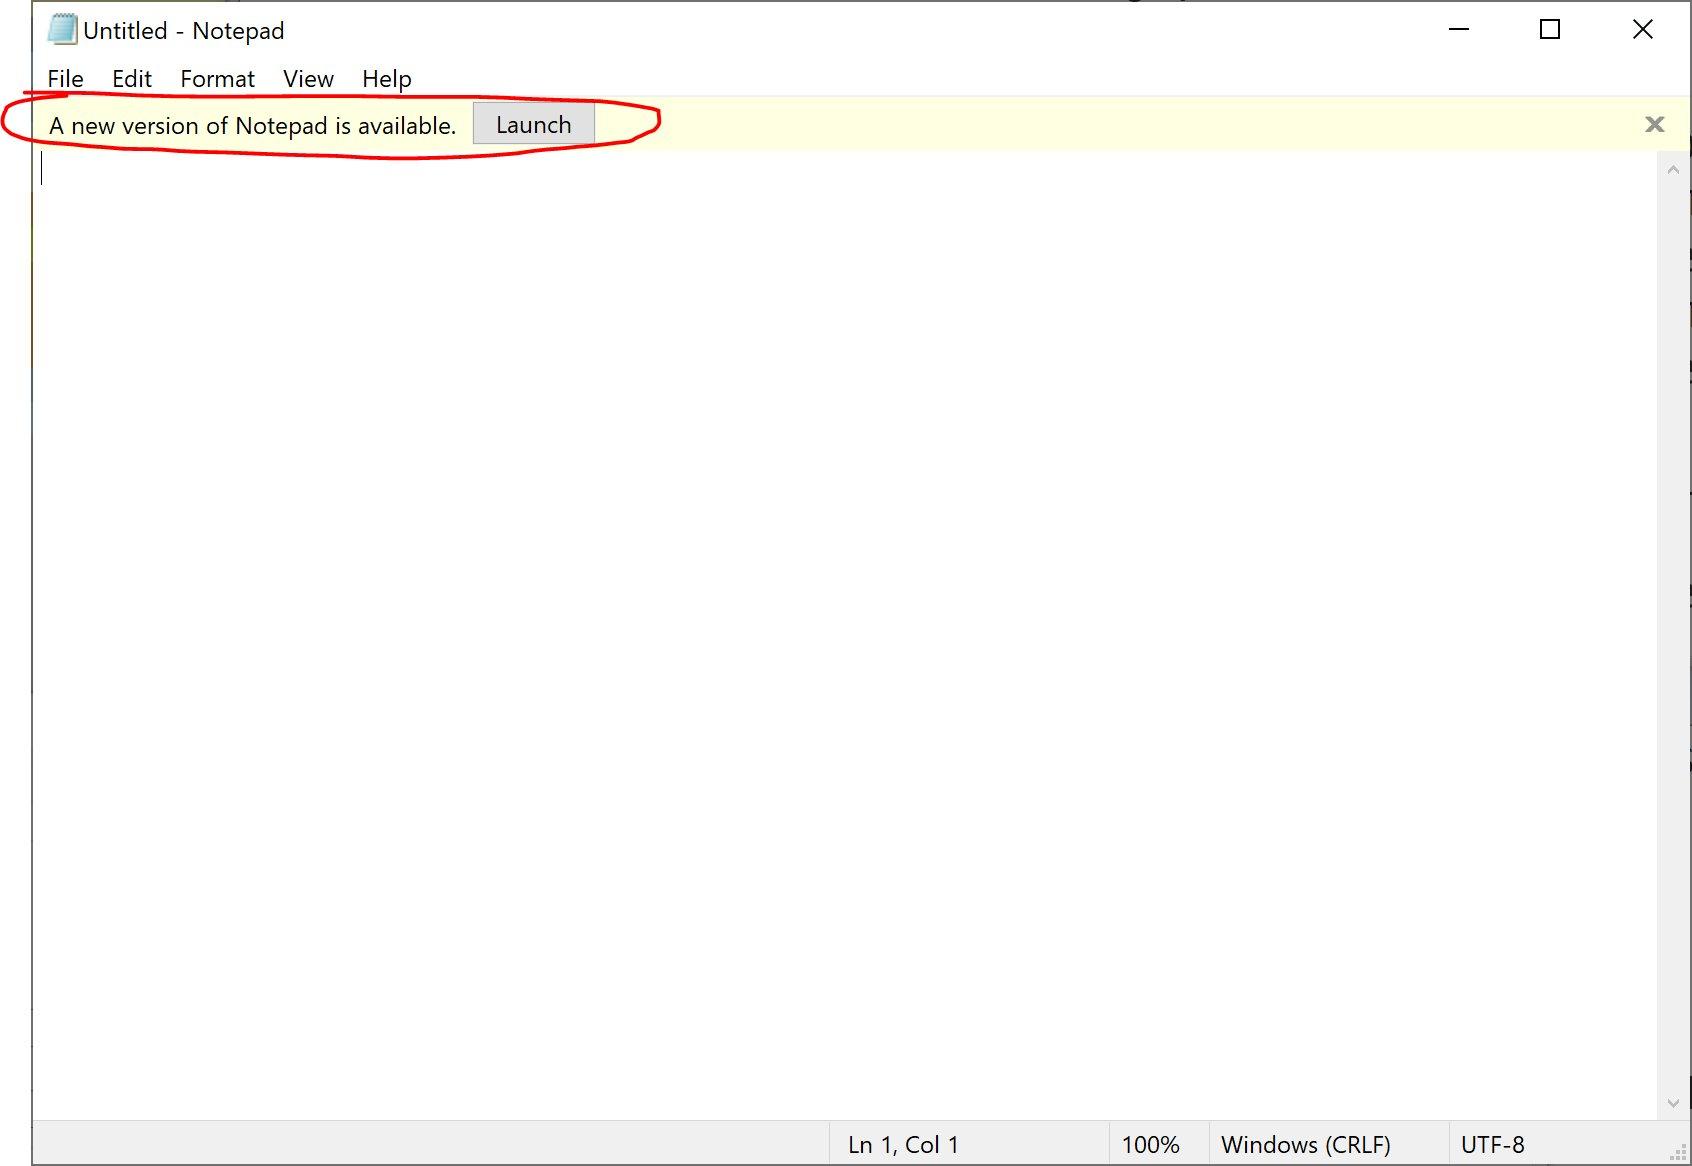 Notepad Update Notification